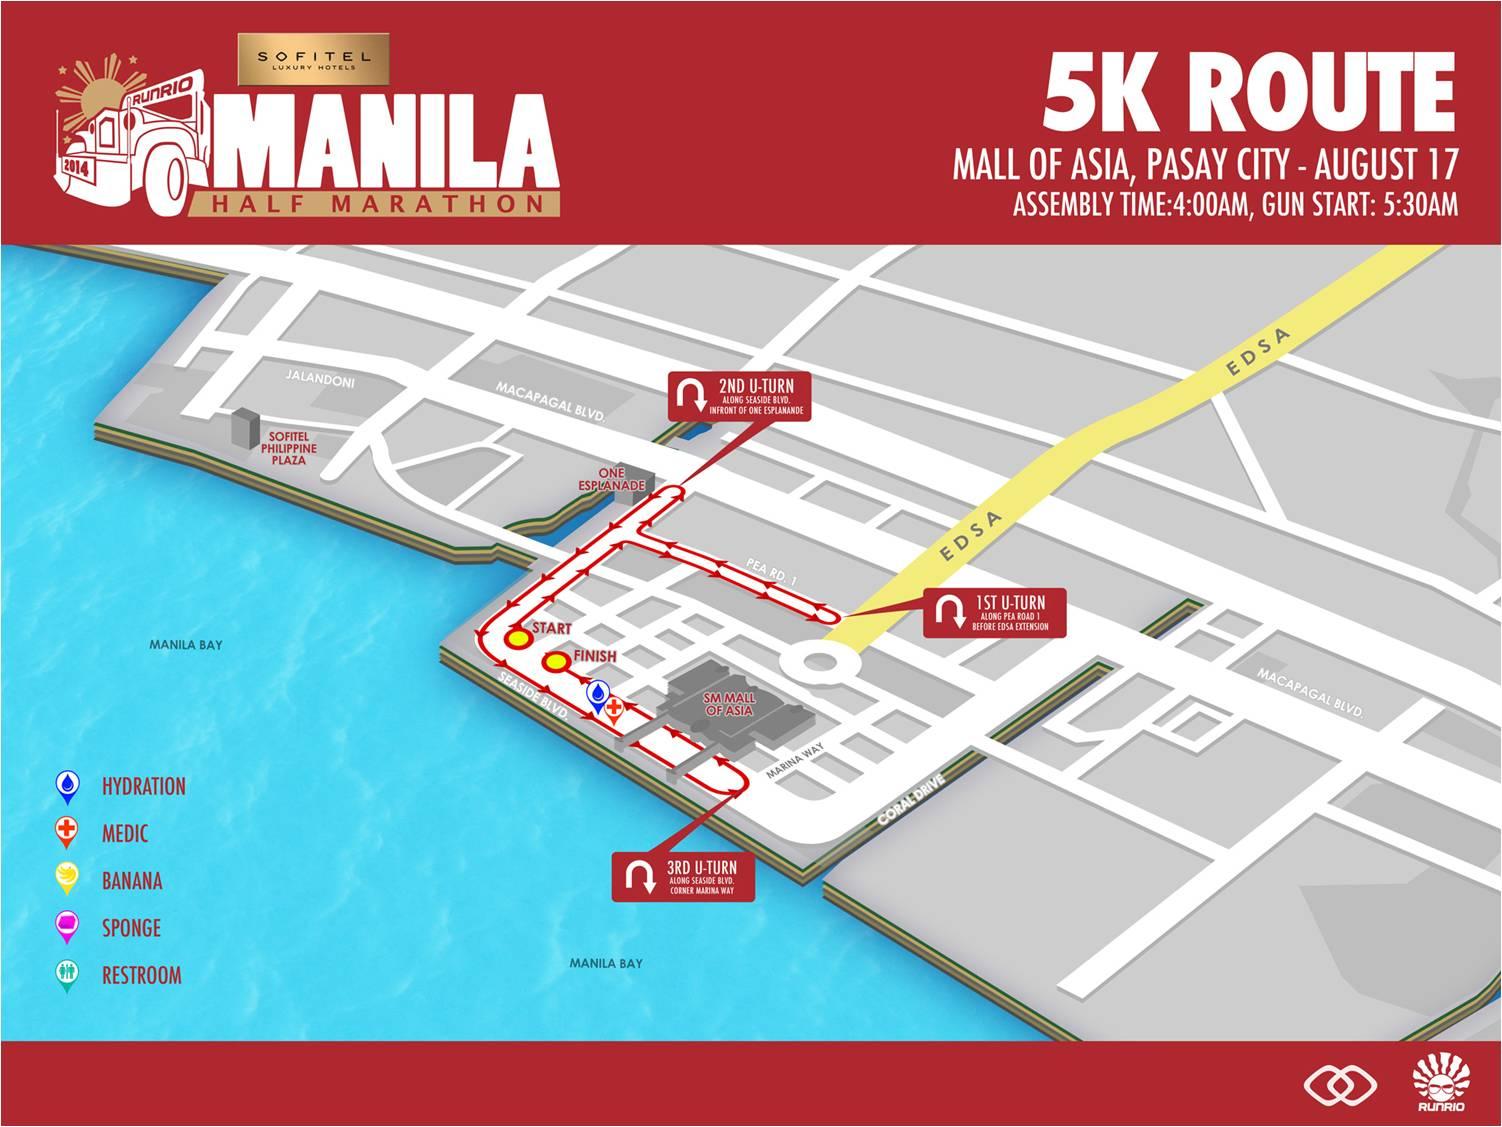 Sofitel Manila Half Marathon 5k route